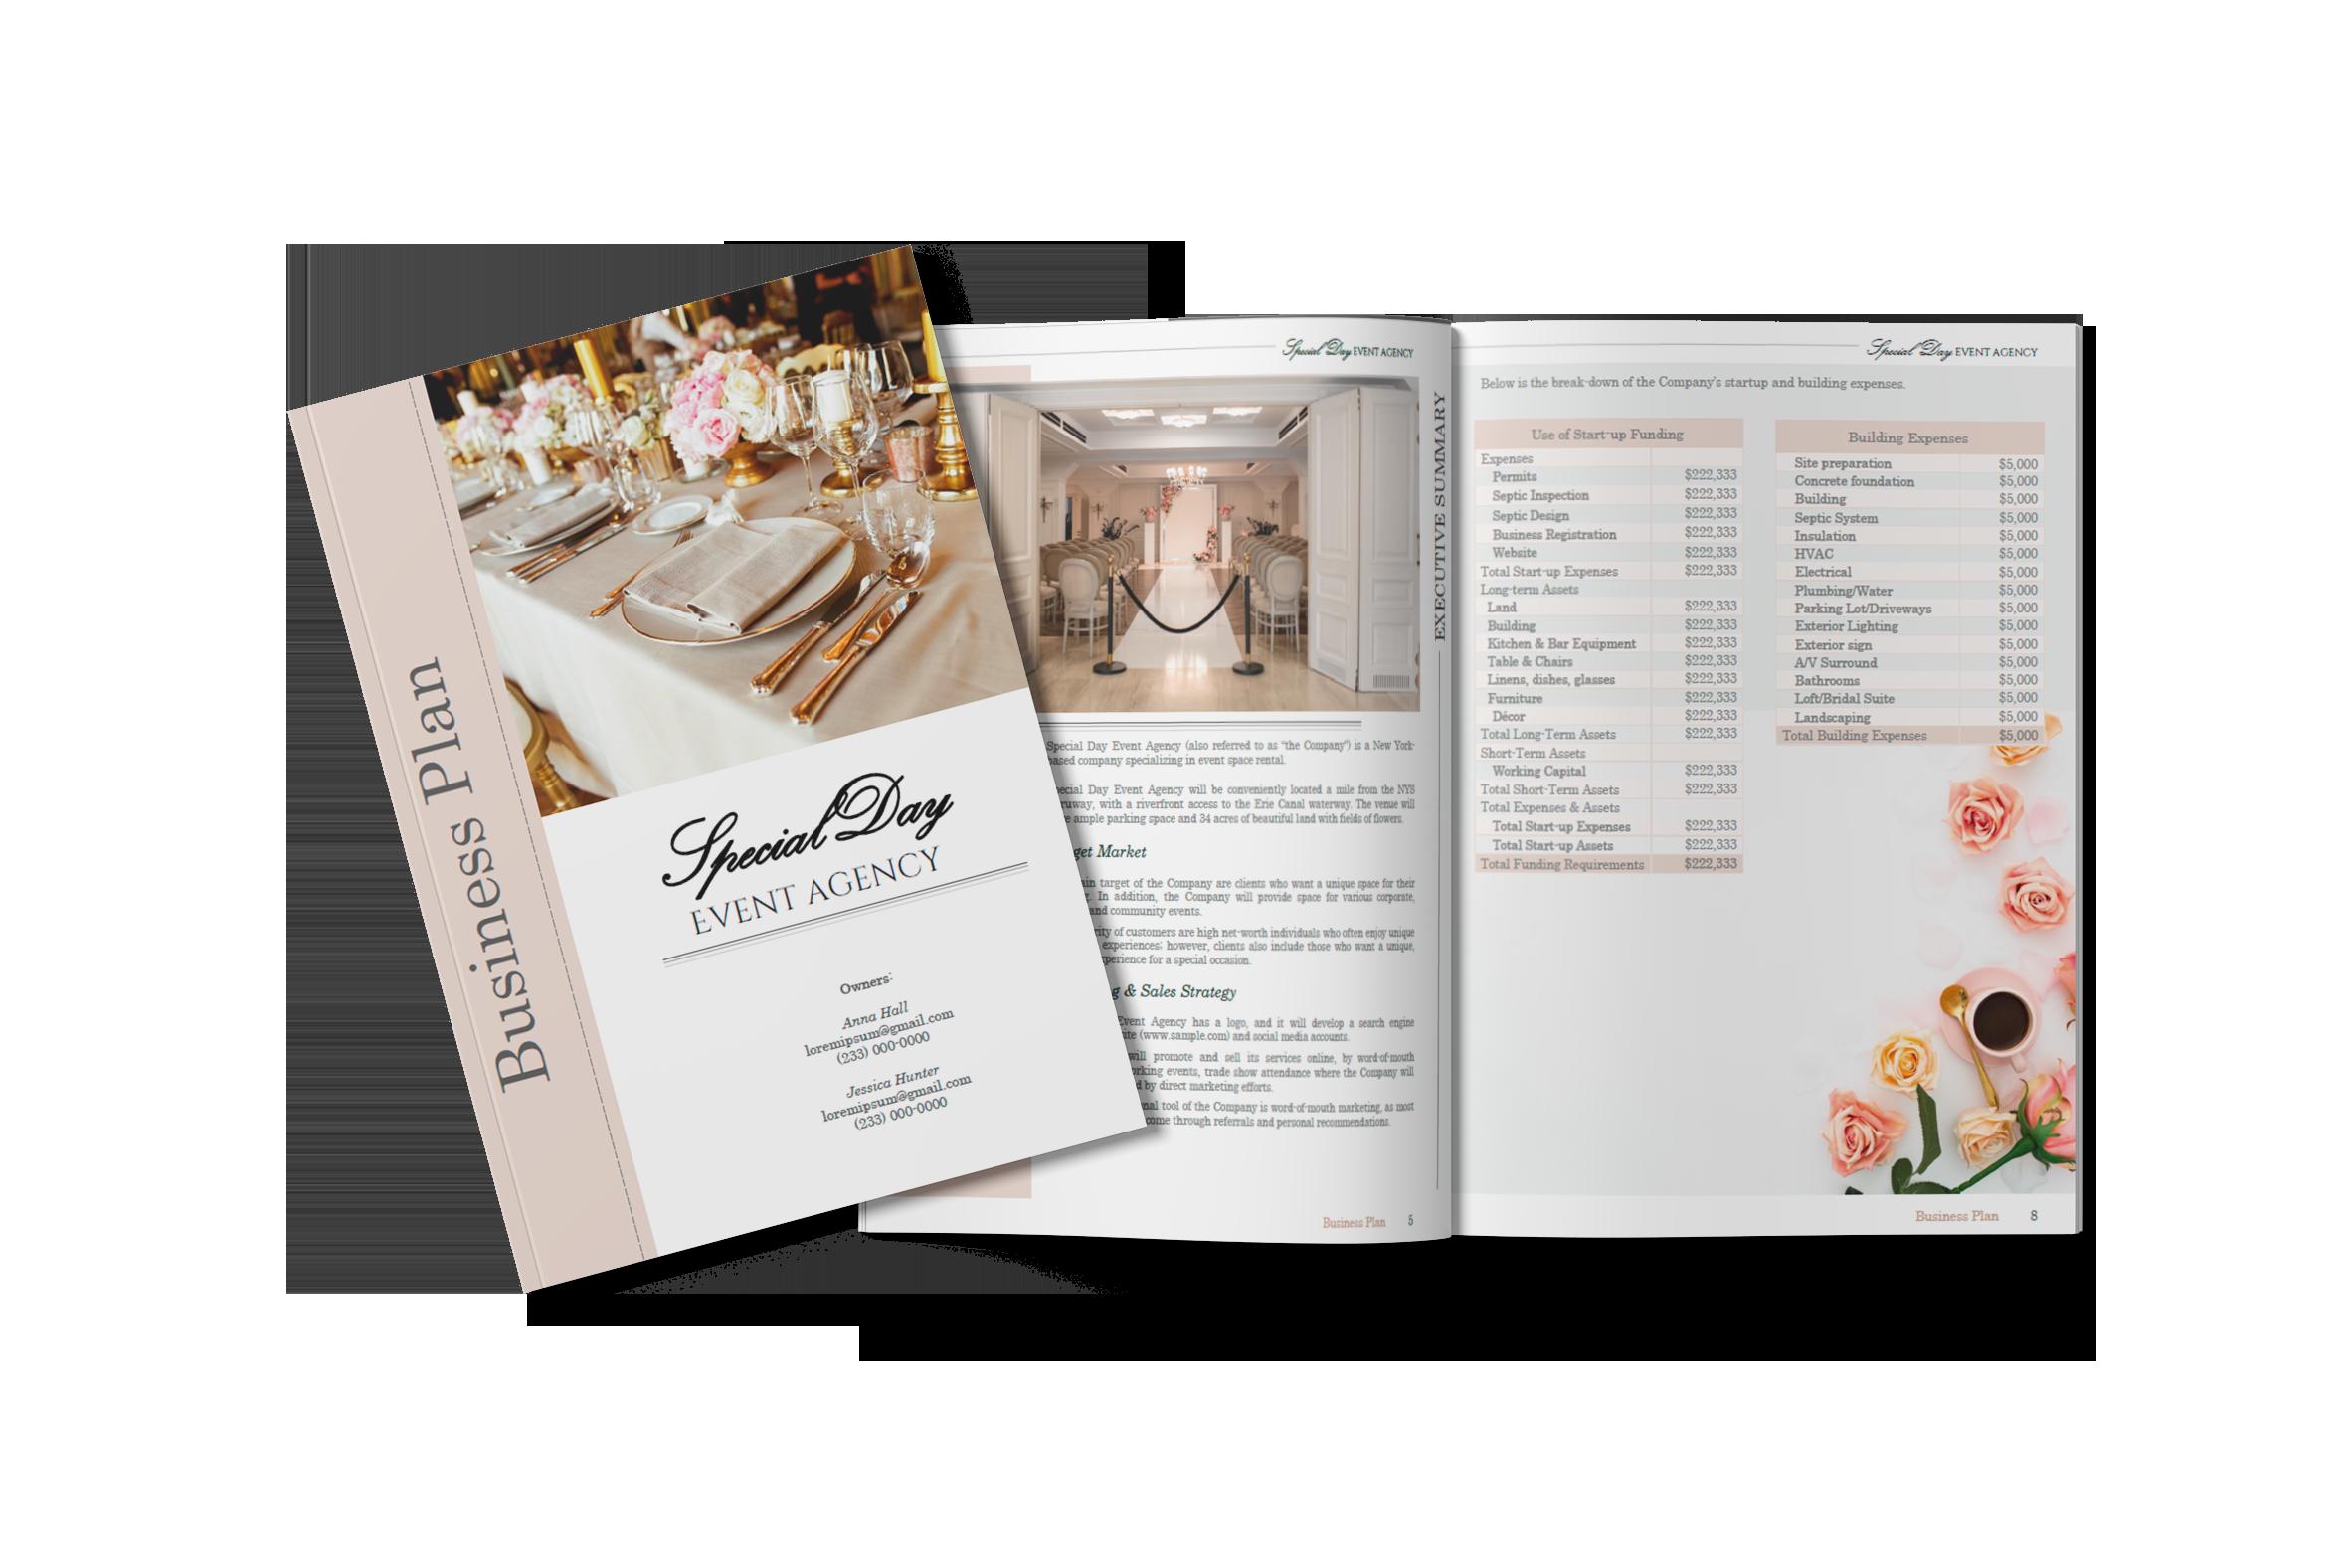 sba business plan sample-1